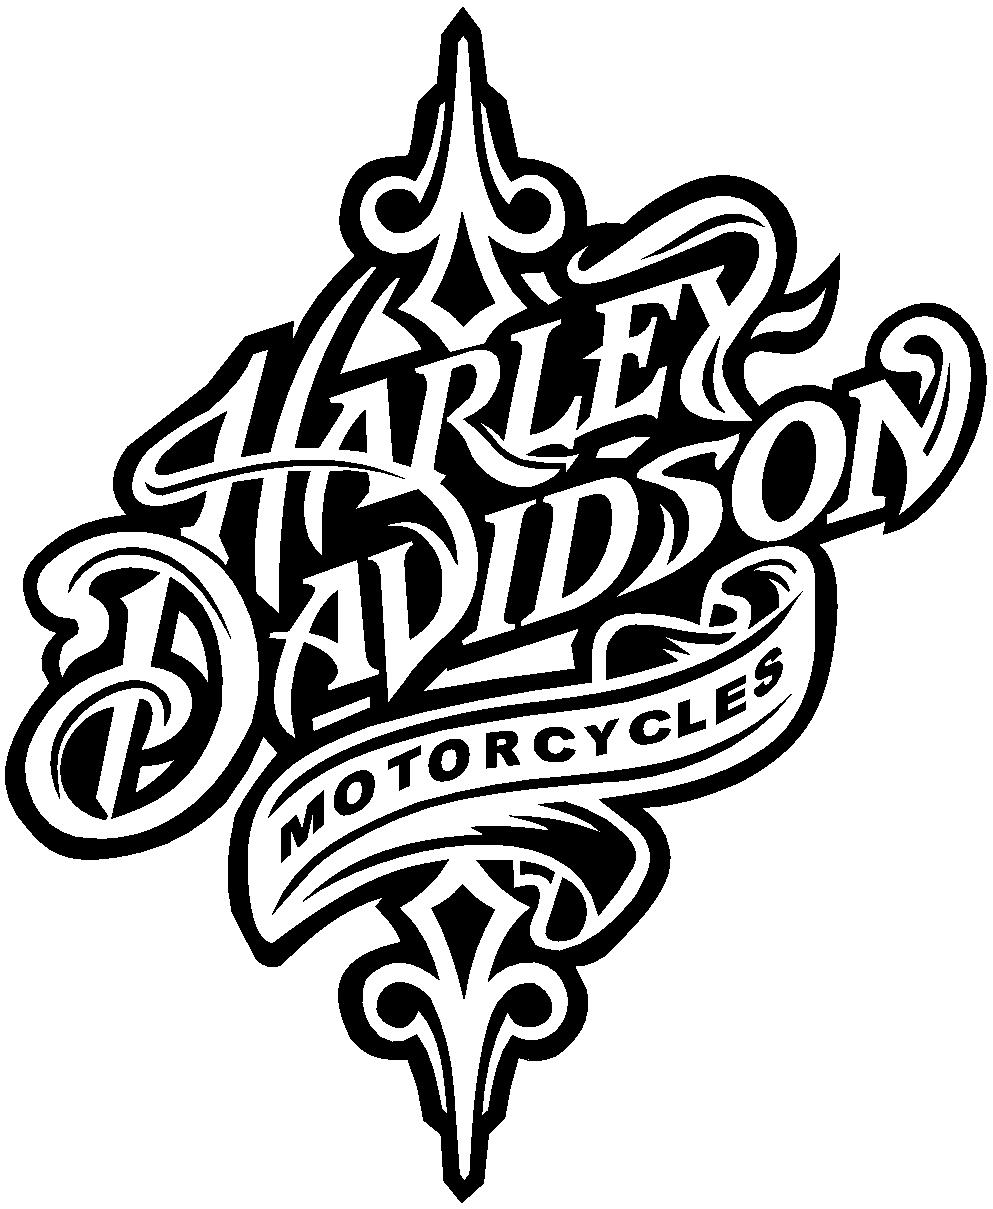 Harley Davidson Logo Png on Car Wings Drawings